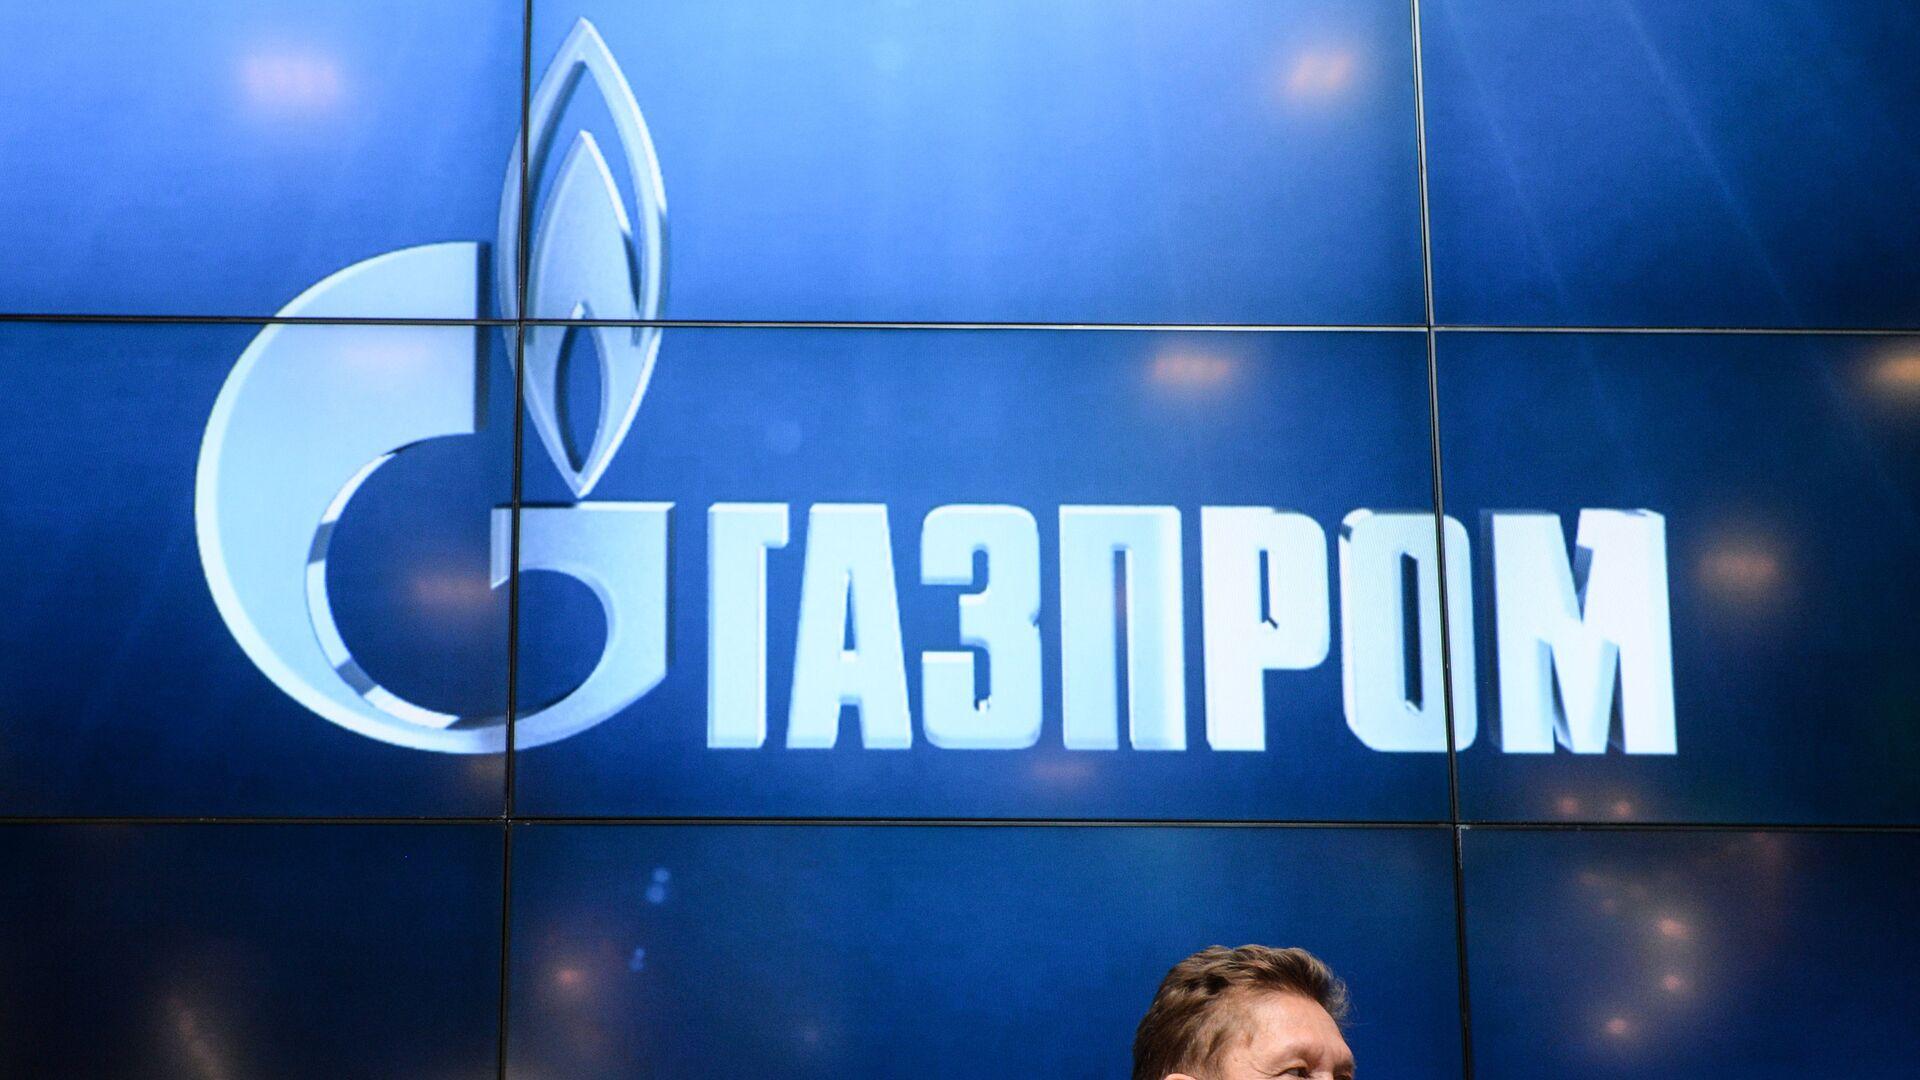 El logo de la empresa rusa Gazprom - Sputnik Mundo, 1920, 27.09.2021